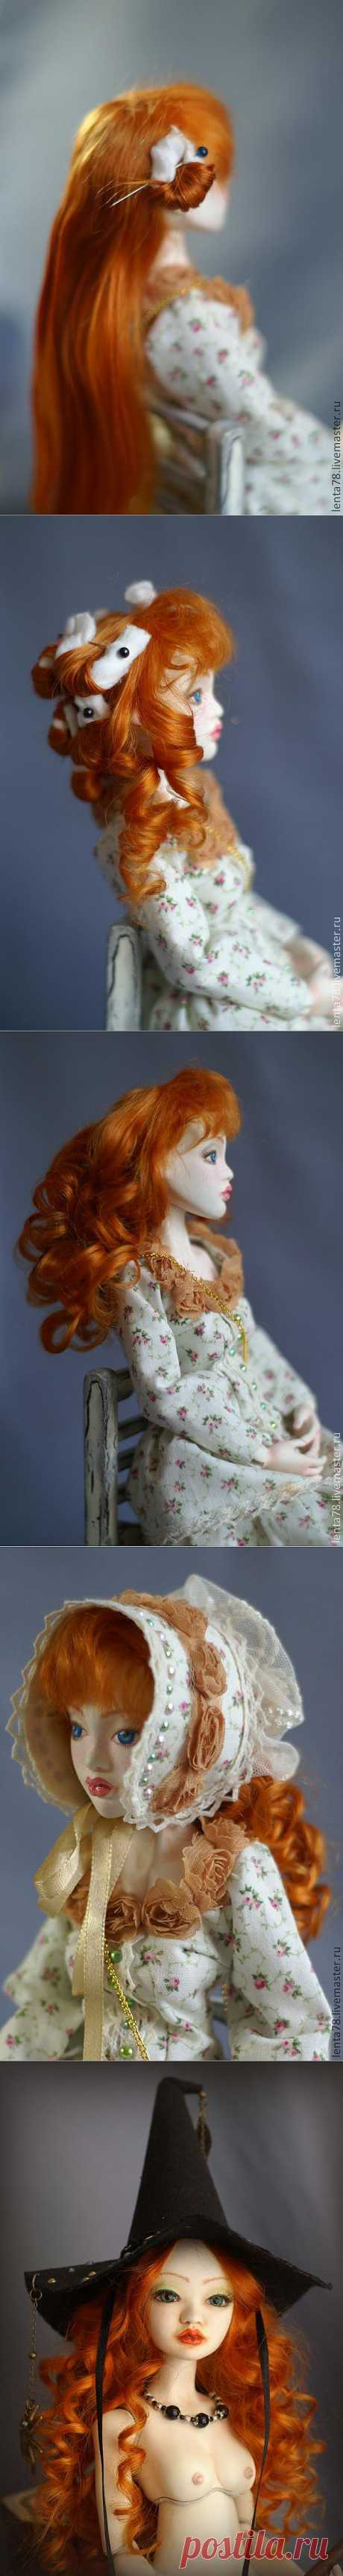 Завивка волос куклы. - Ярмарка Мастеров - ручная работа, handmade